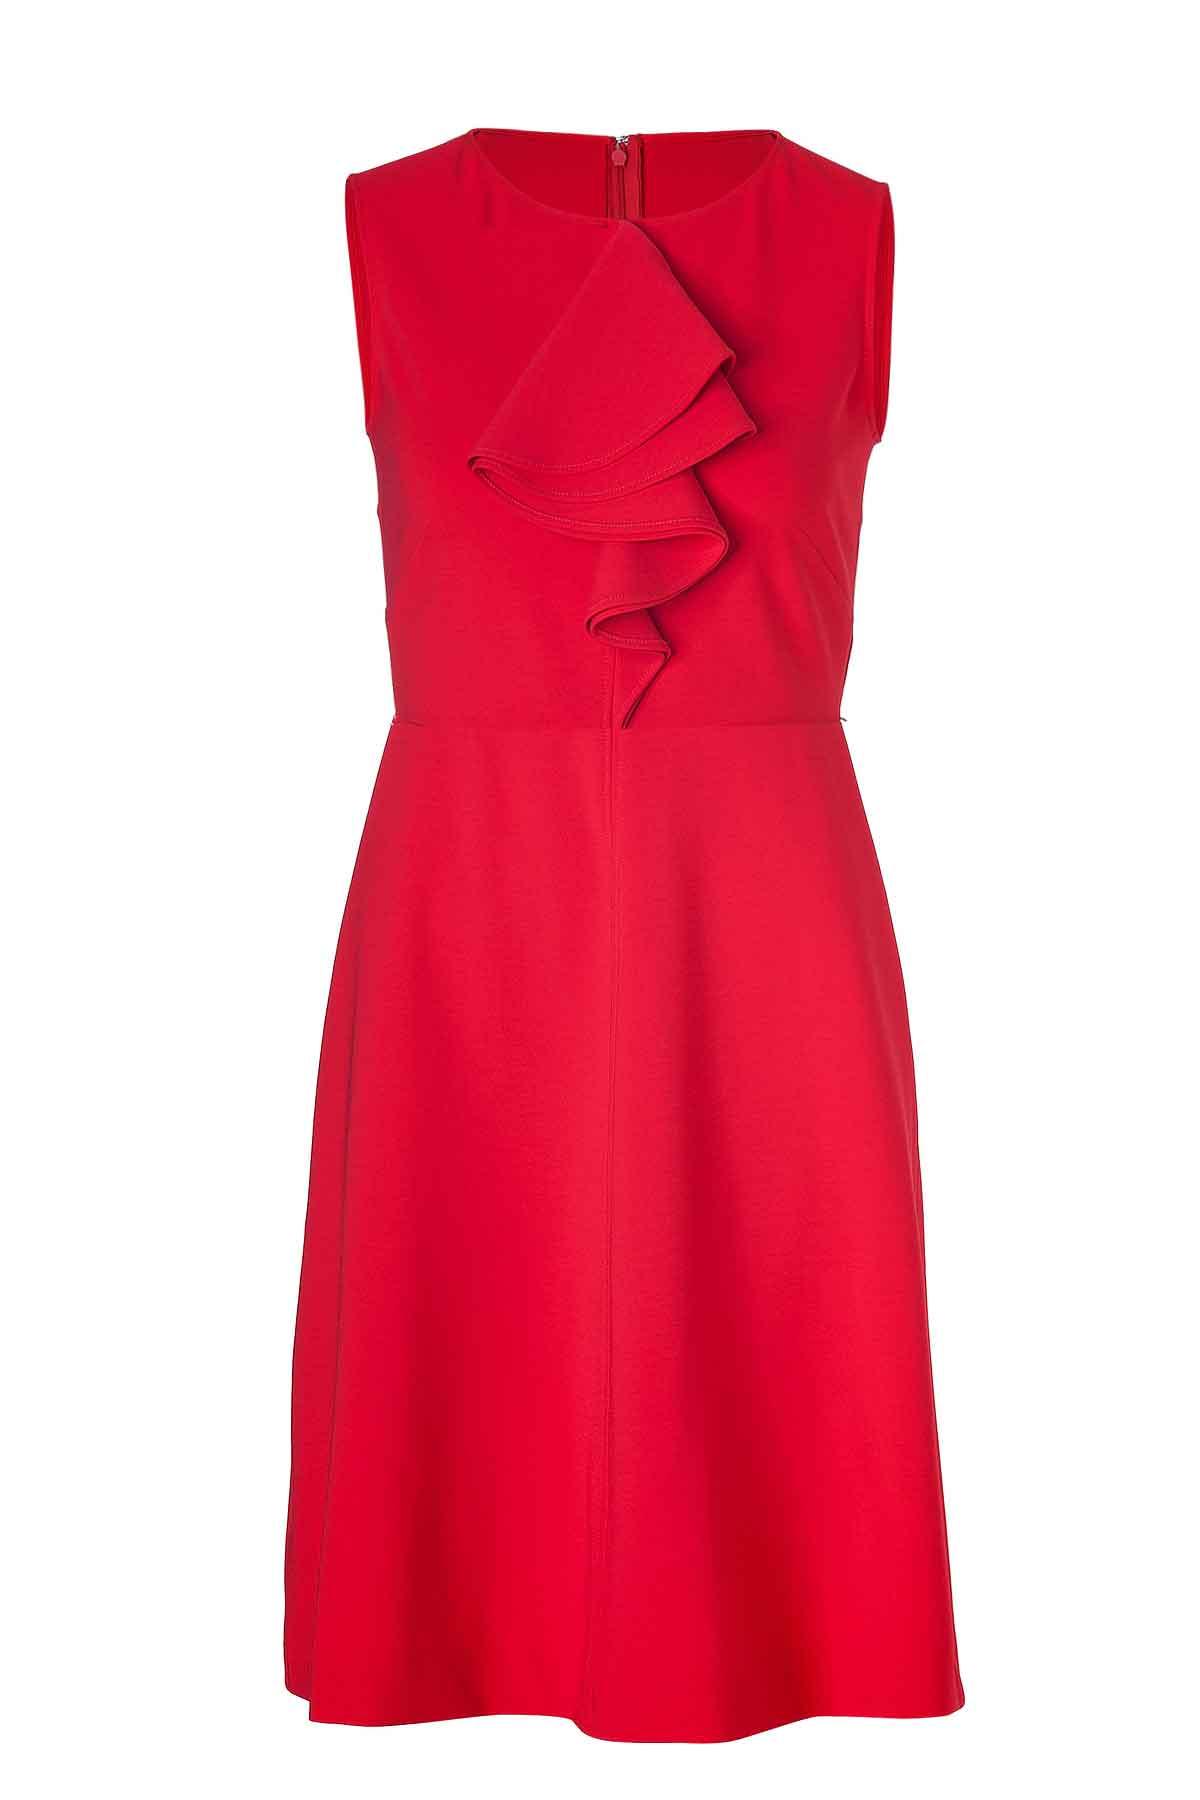 3013bd9d88809 Bright Red Linen Dress, Custom Fit, Fully Lined, Handmade, Linen Fabric